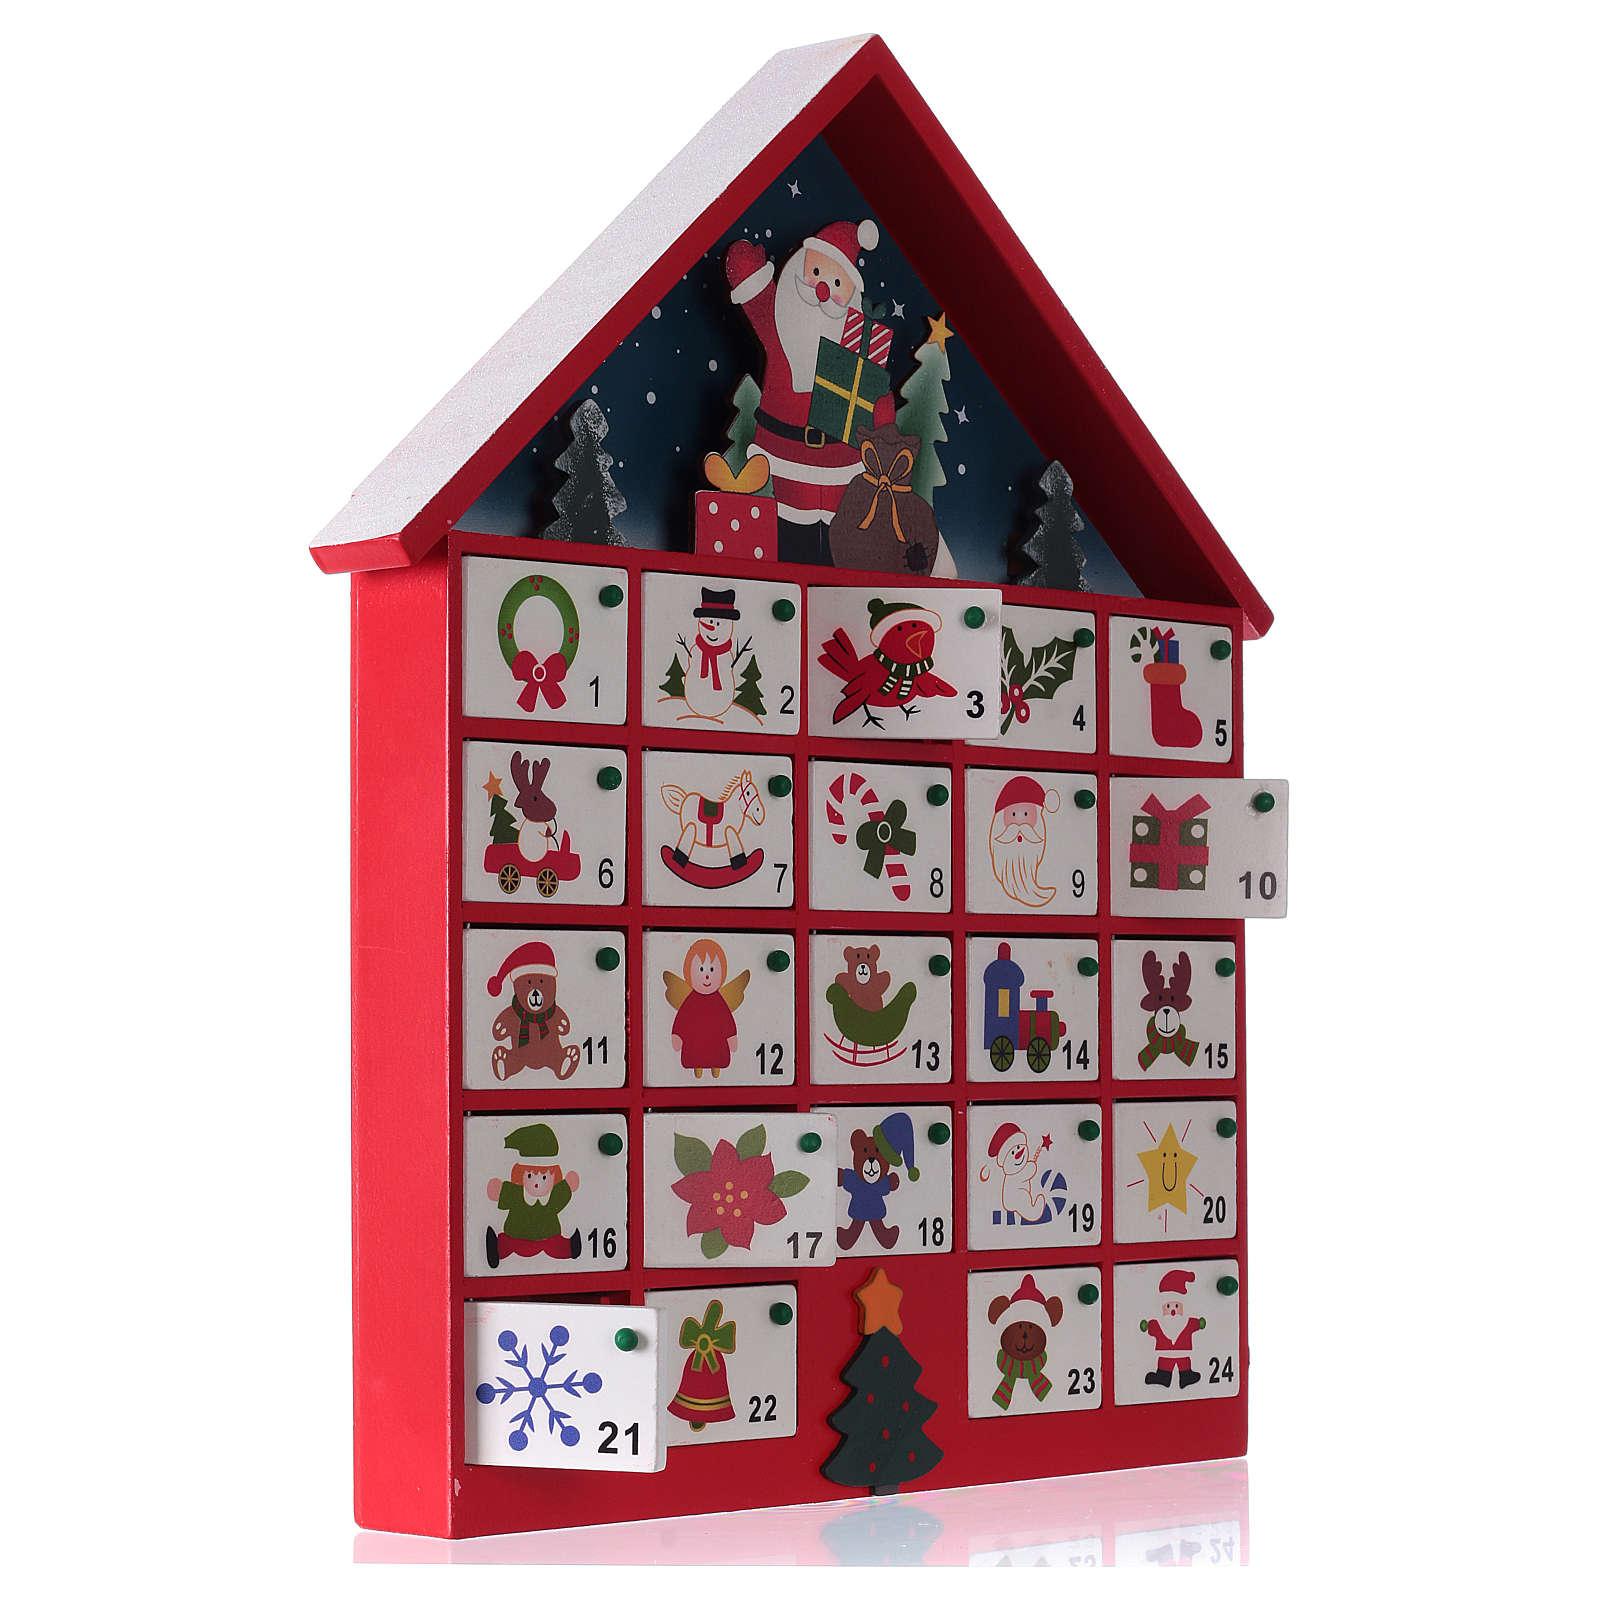 Calendario de adviento casa de madera roja 20x35x5 cm 3